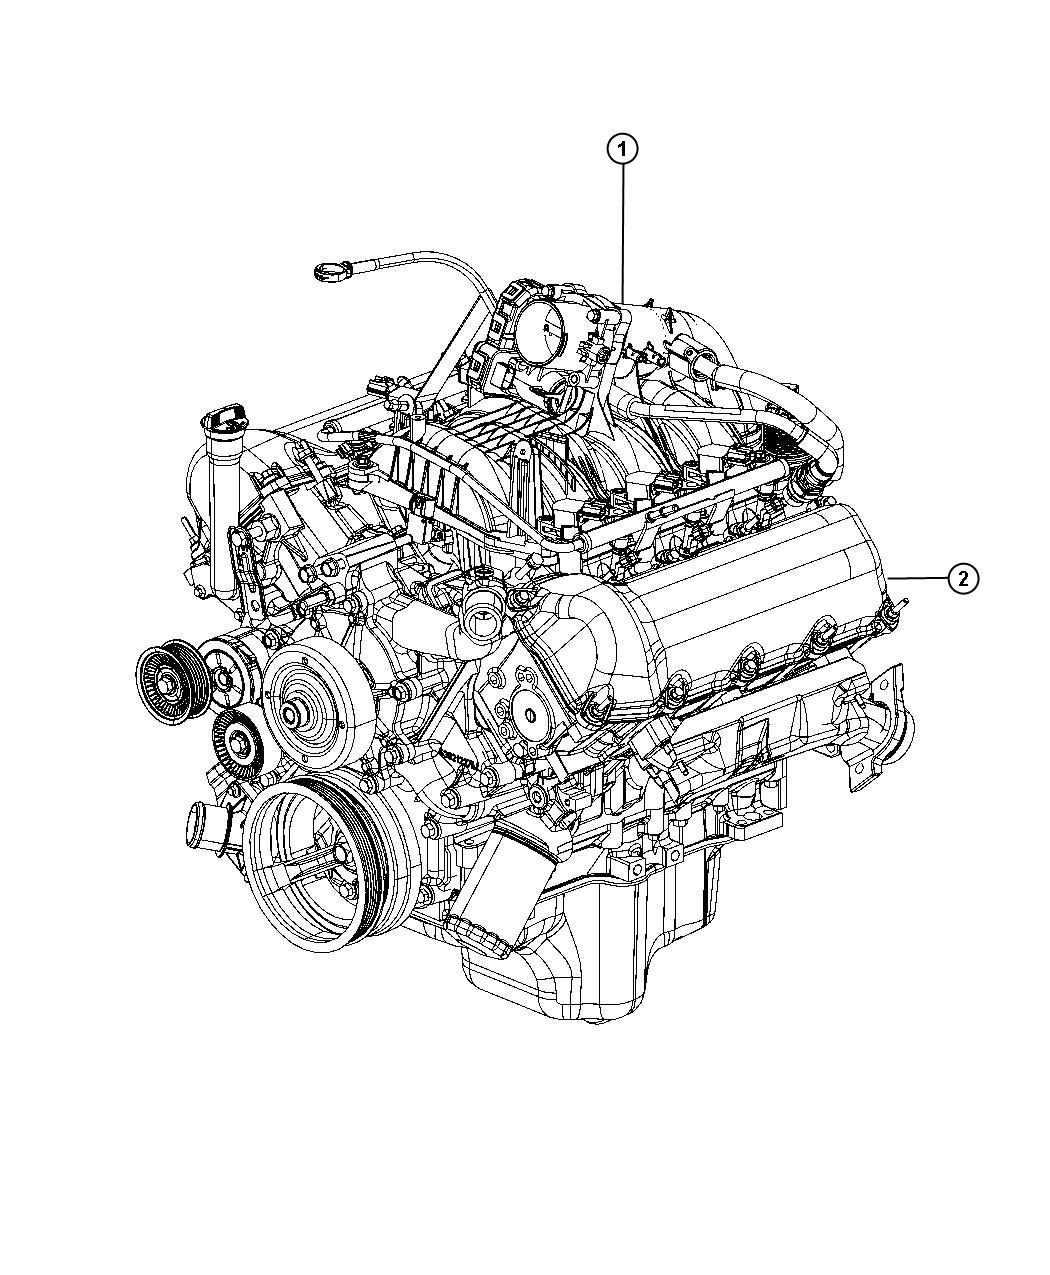 Dodge Dakota Engine  Long Block  Remanufactured  Service  Identification  Assembly